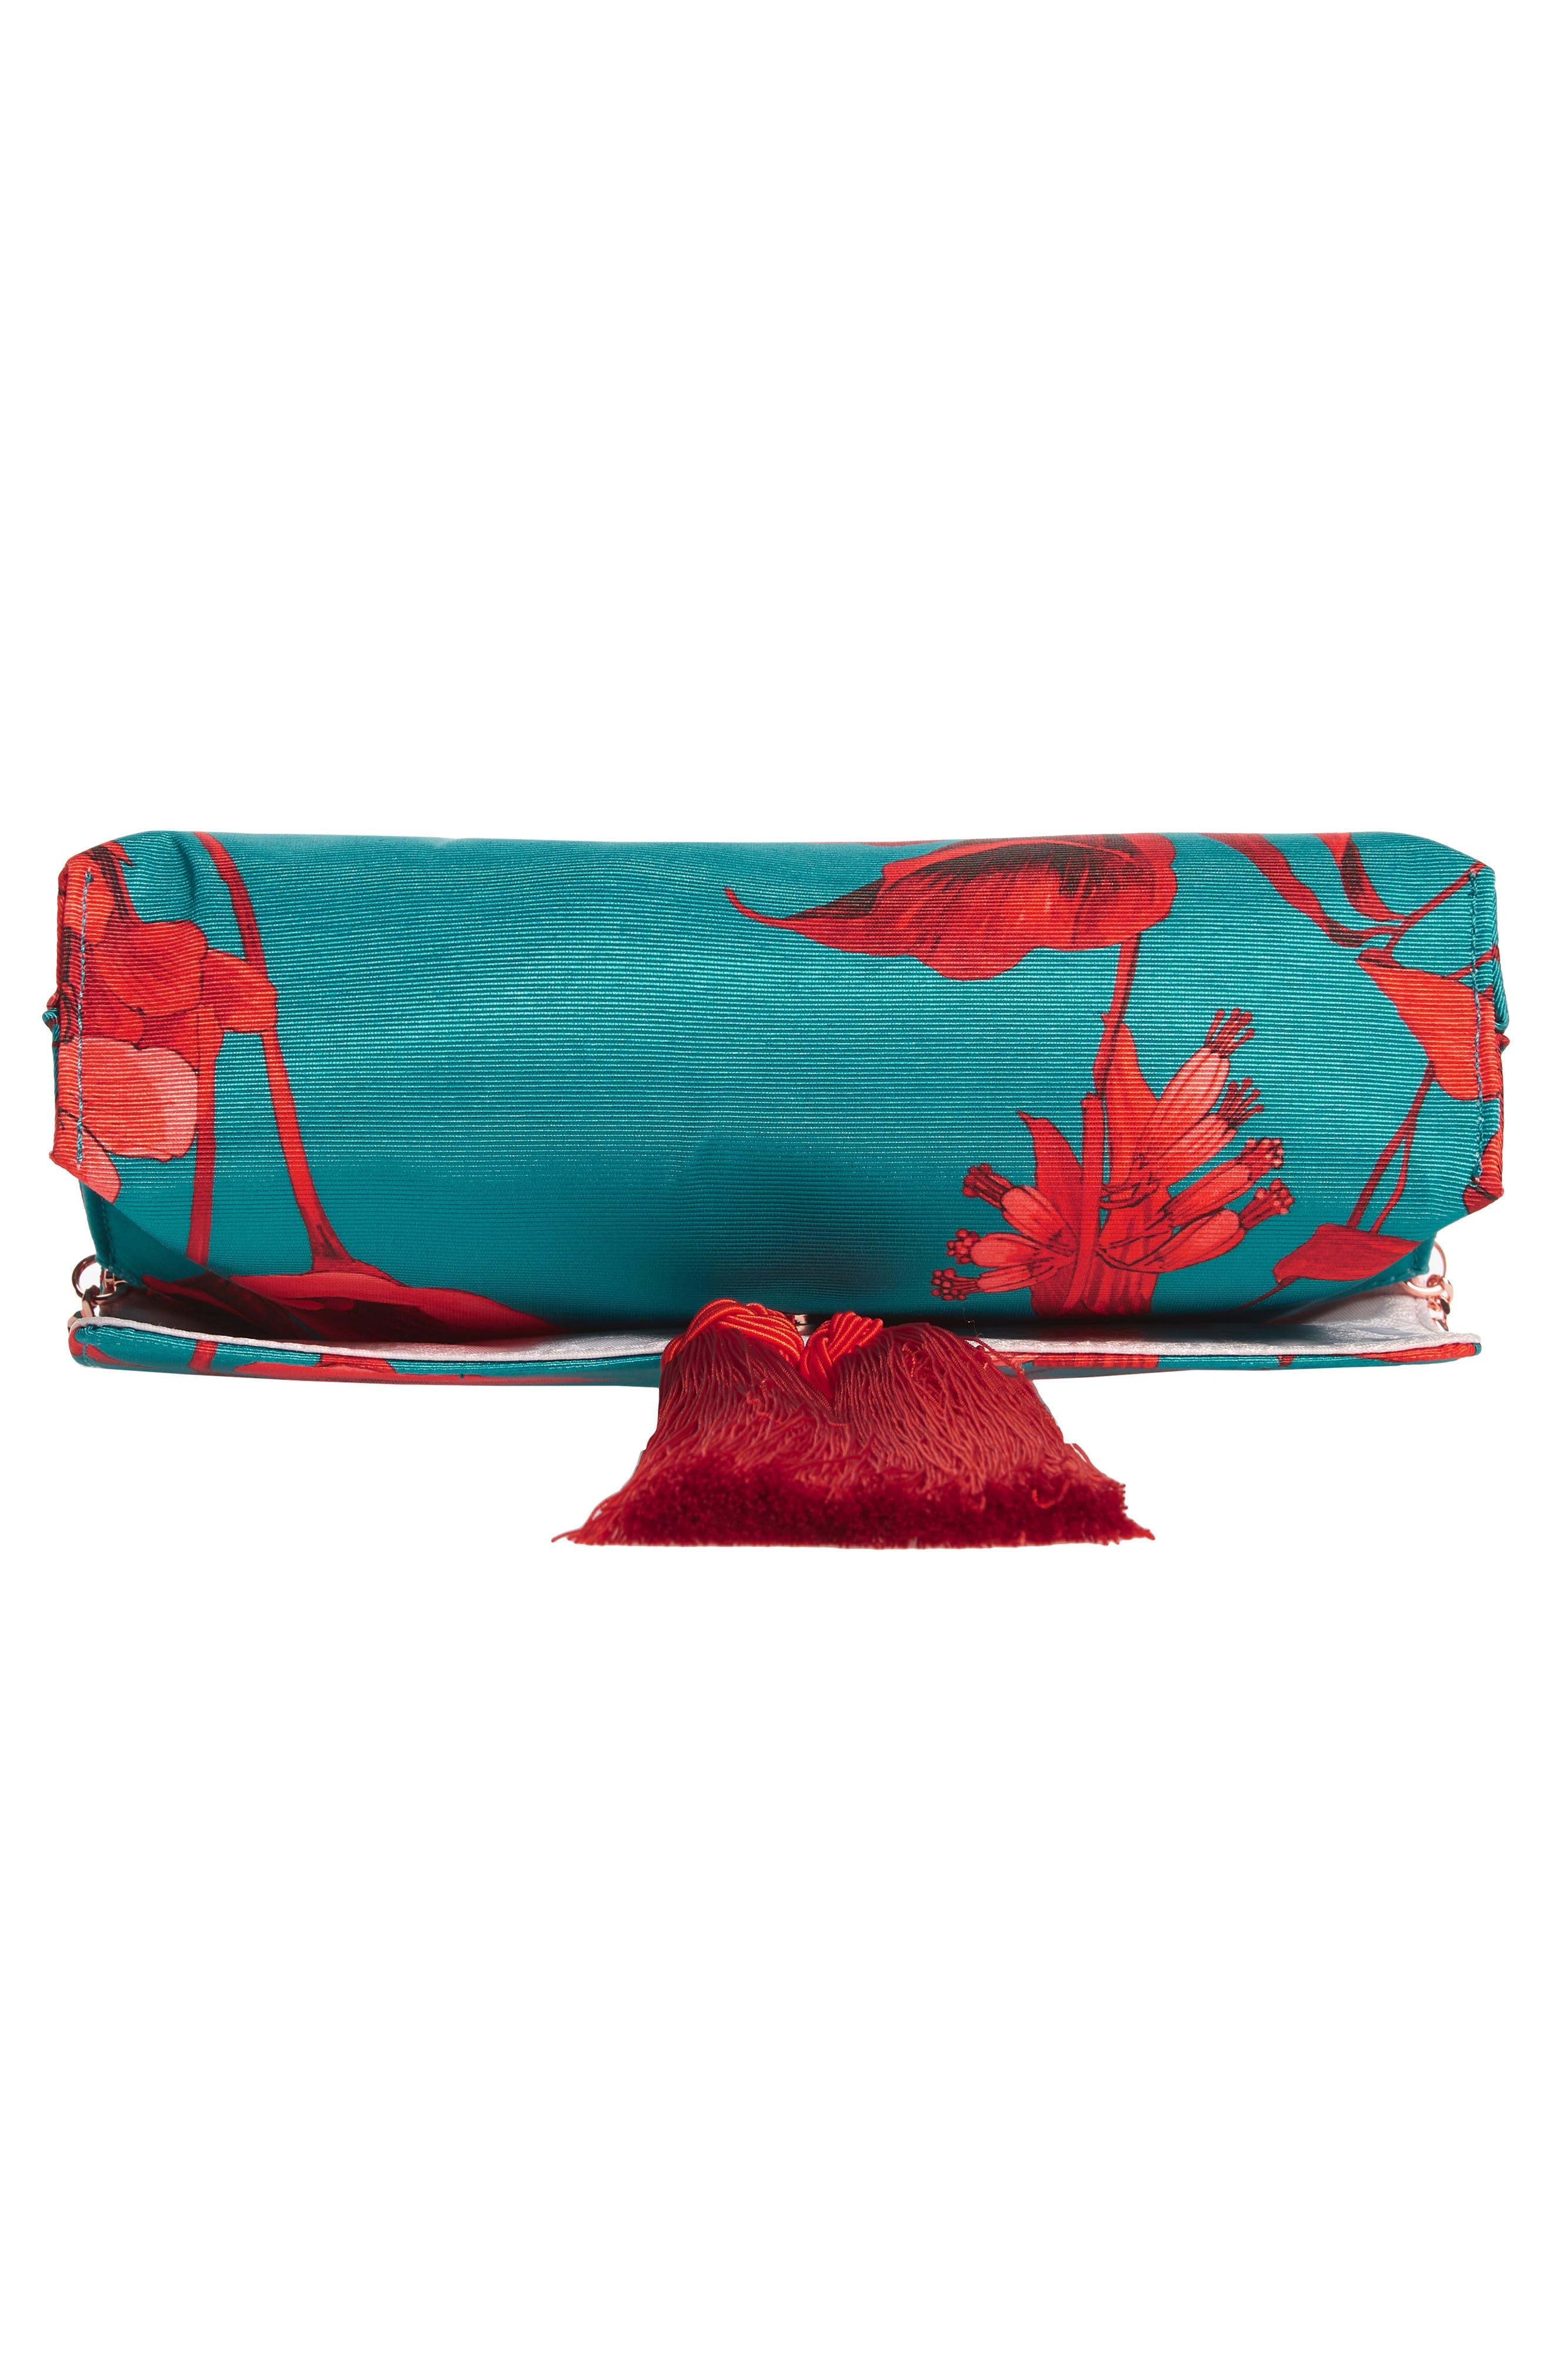 Darlee Fantasia Tassel Bag,                             Alternate thumbnail 7, color,                             TURQUOISE